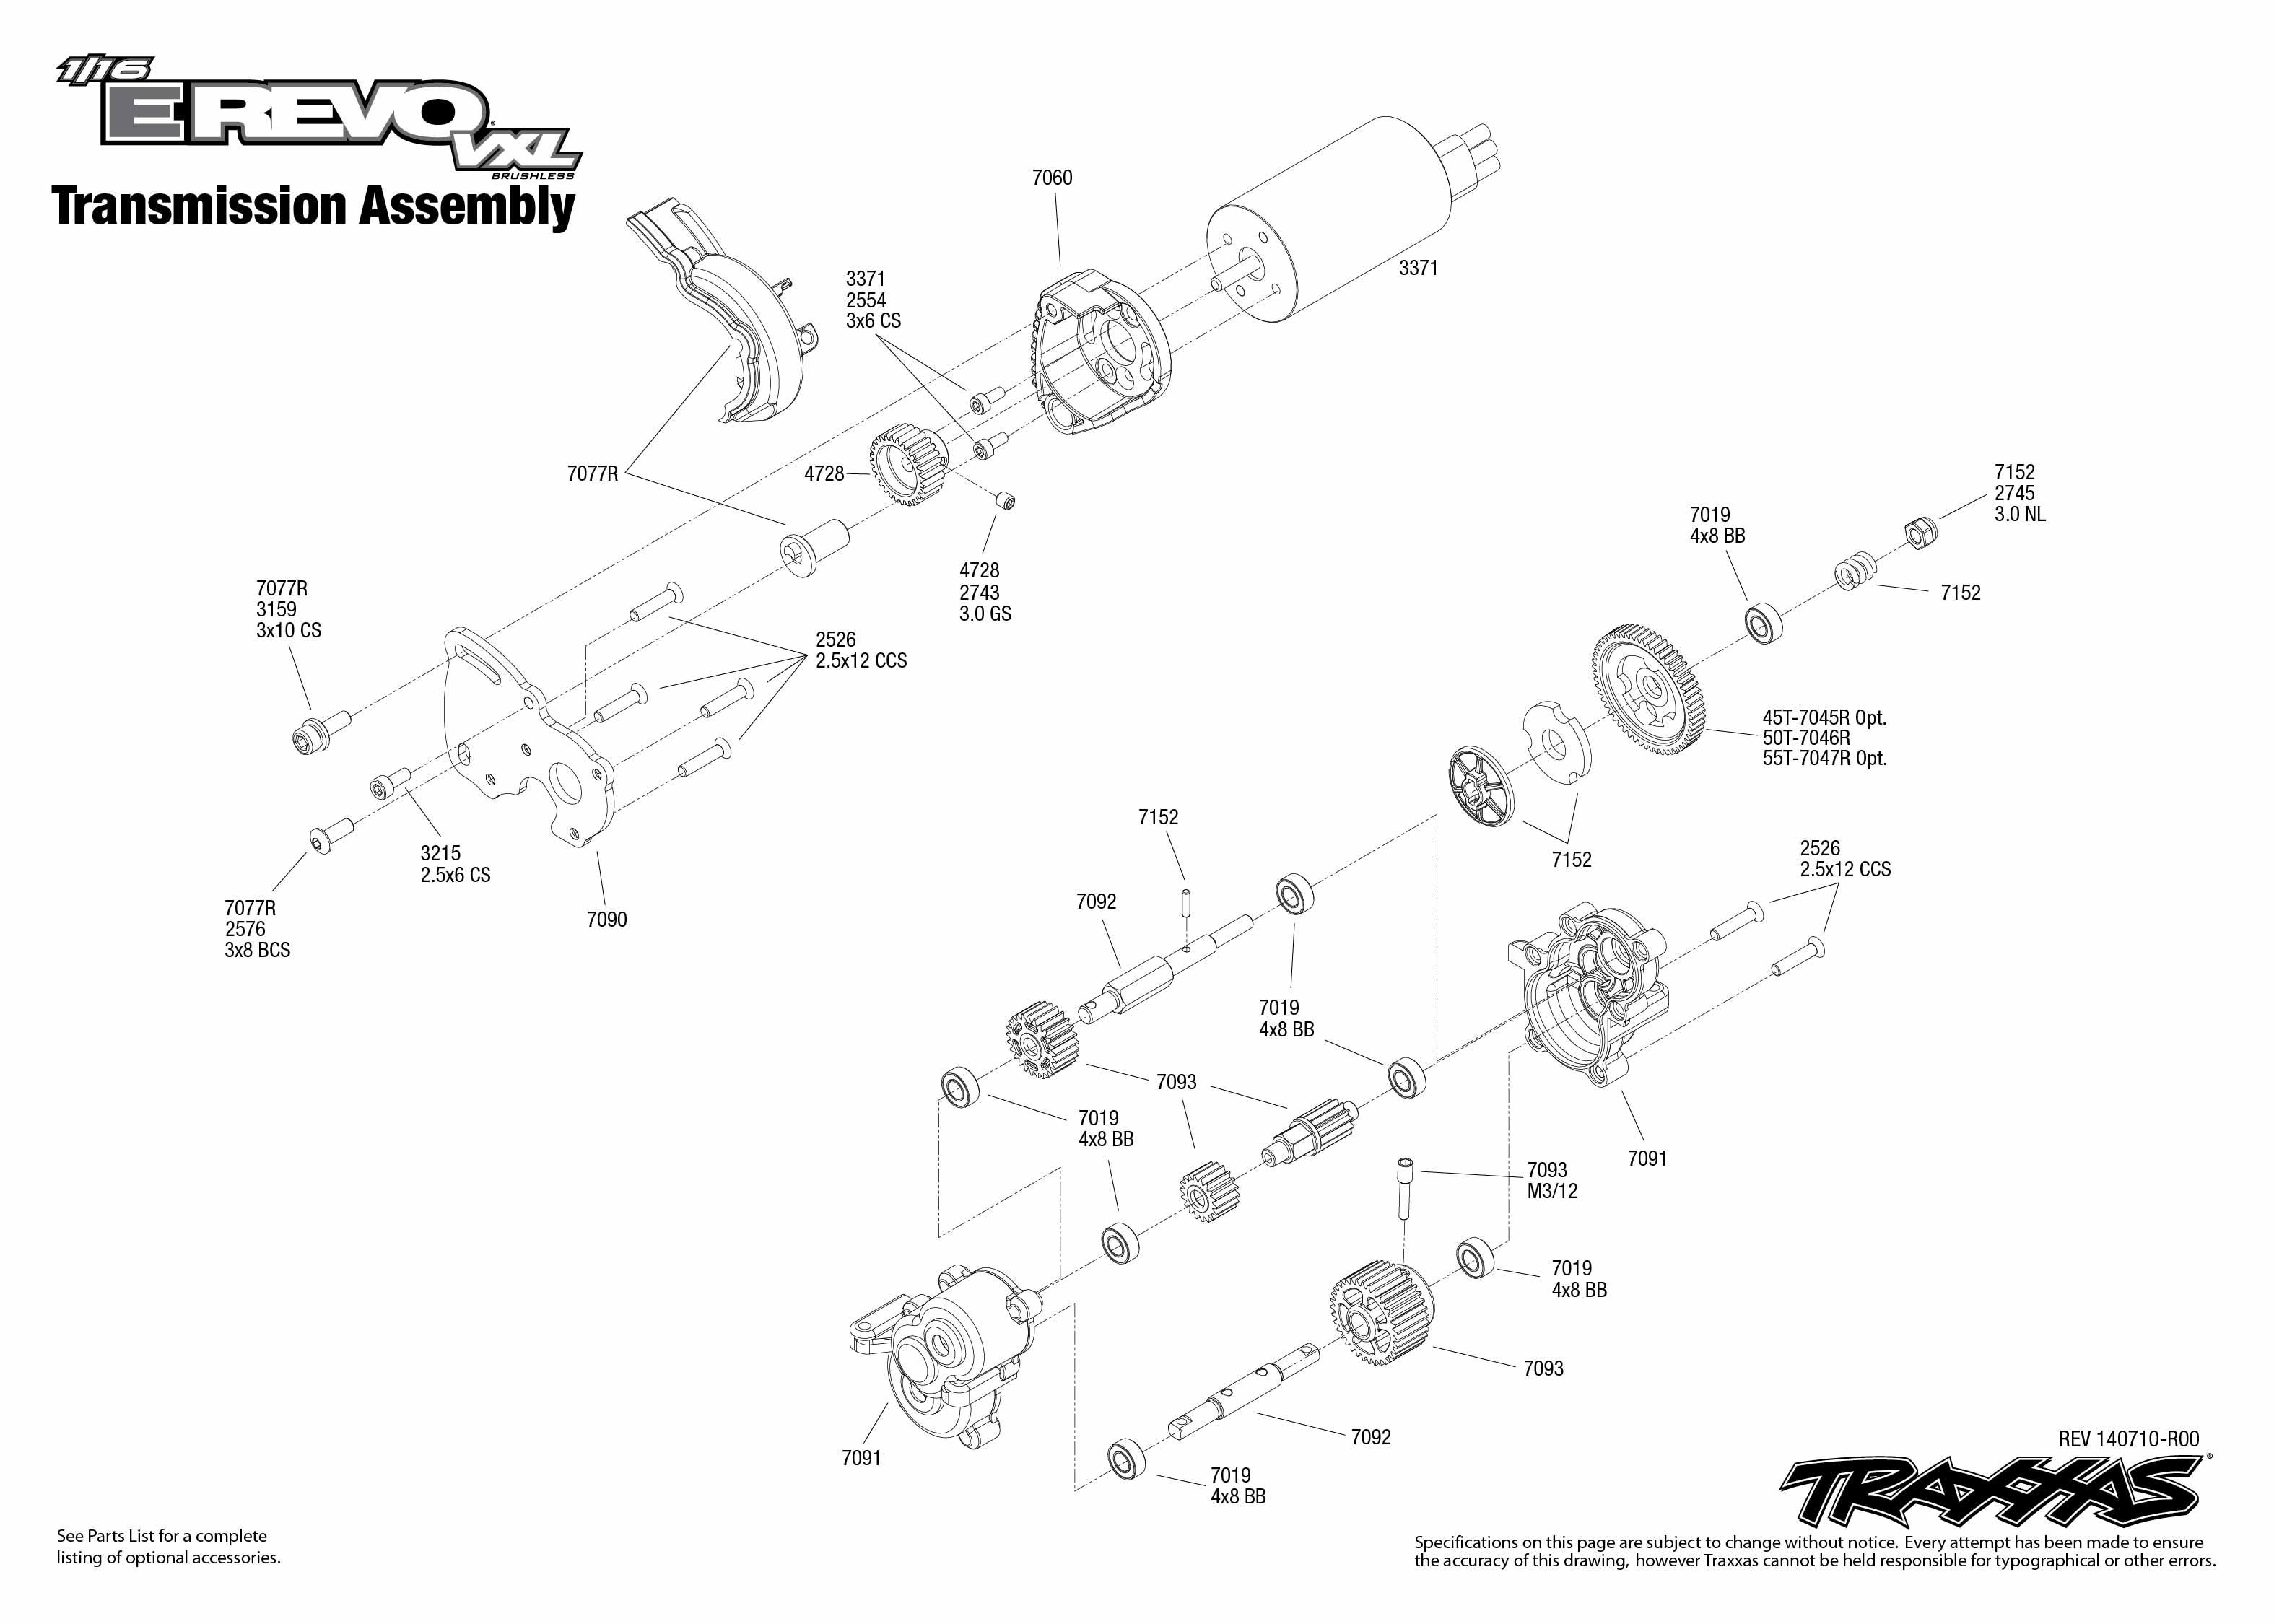 1 16 E Revo Vxl 1 Transmission Assembly Exploded